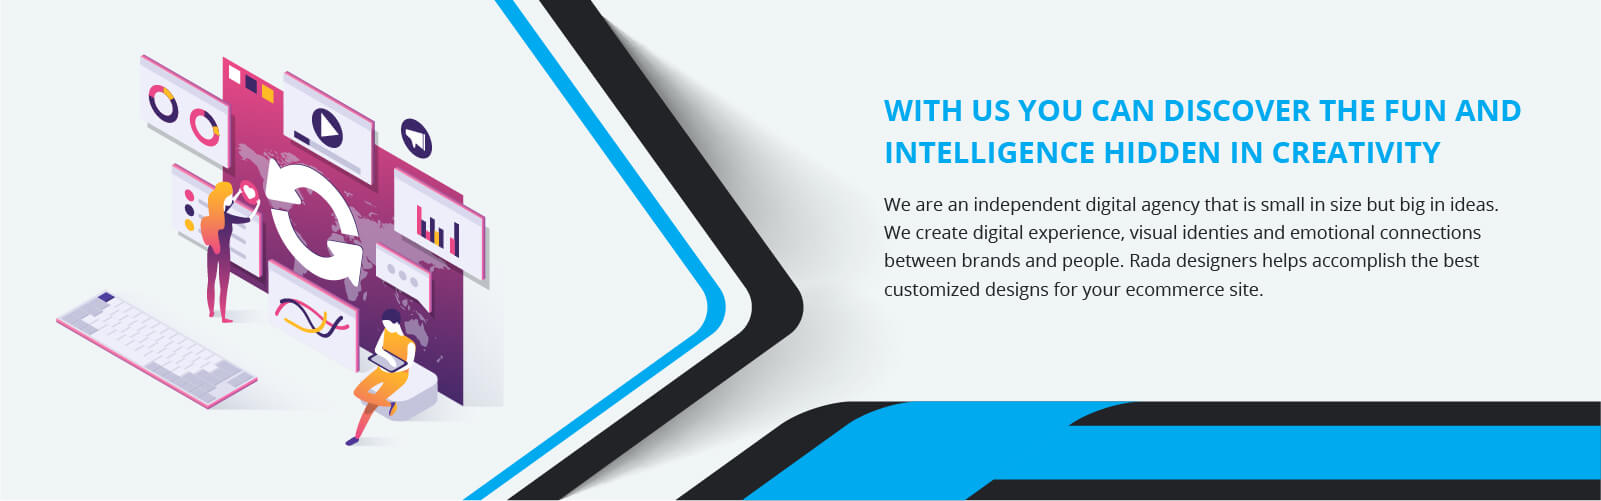 Web Designing Development Company In Chennai India